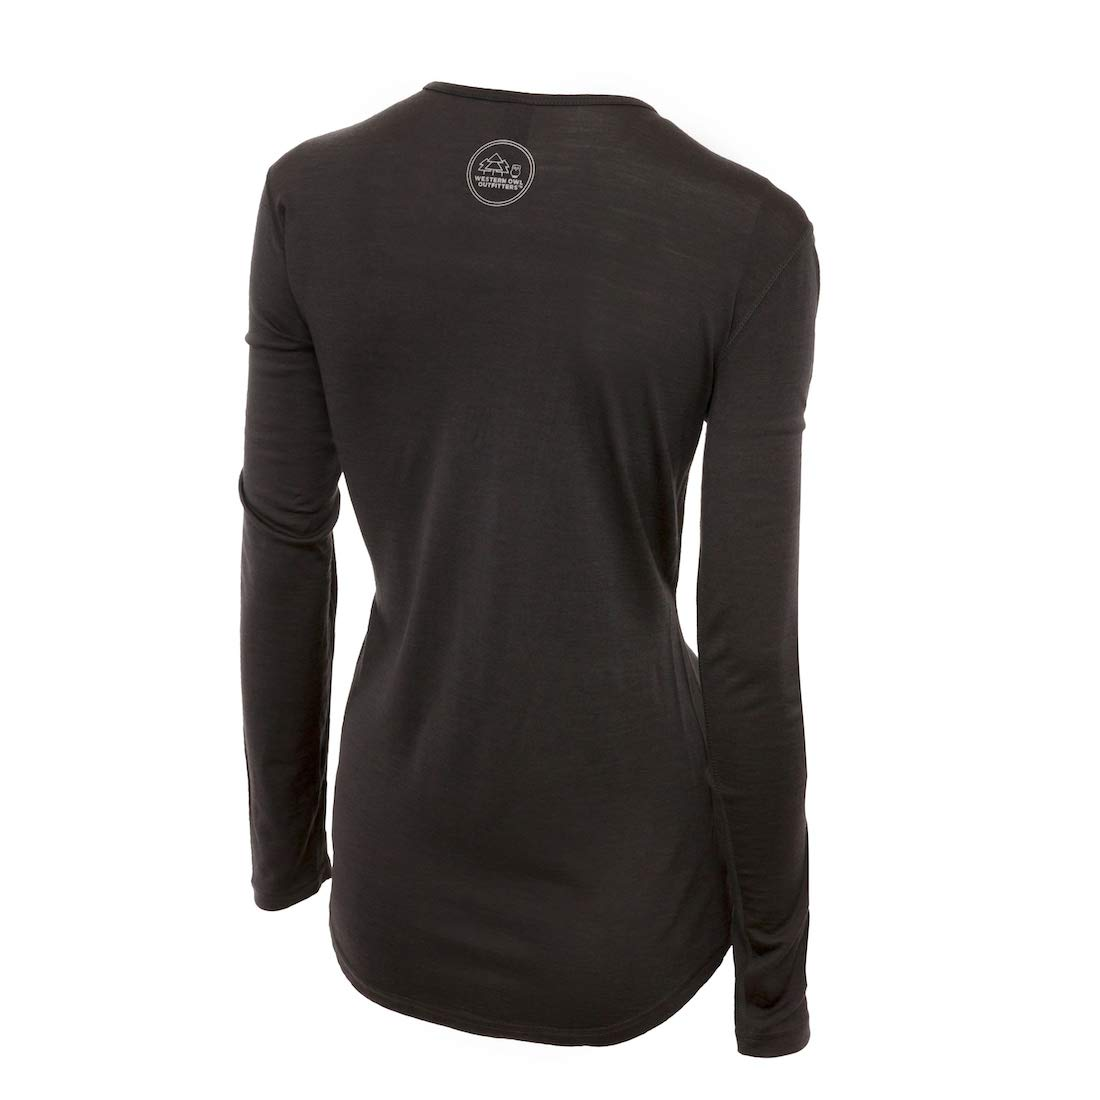 Merino Wool Women's Long Sleeve Top |Crew Neck Shirt | Lightweight | Moisture Wicking | Top Base Layer | Small Grey